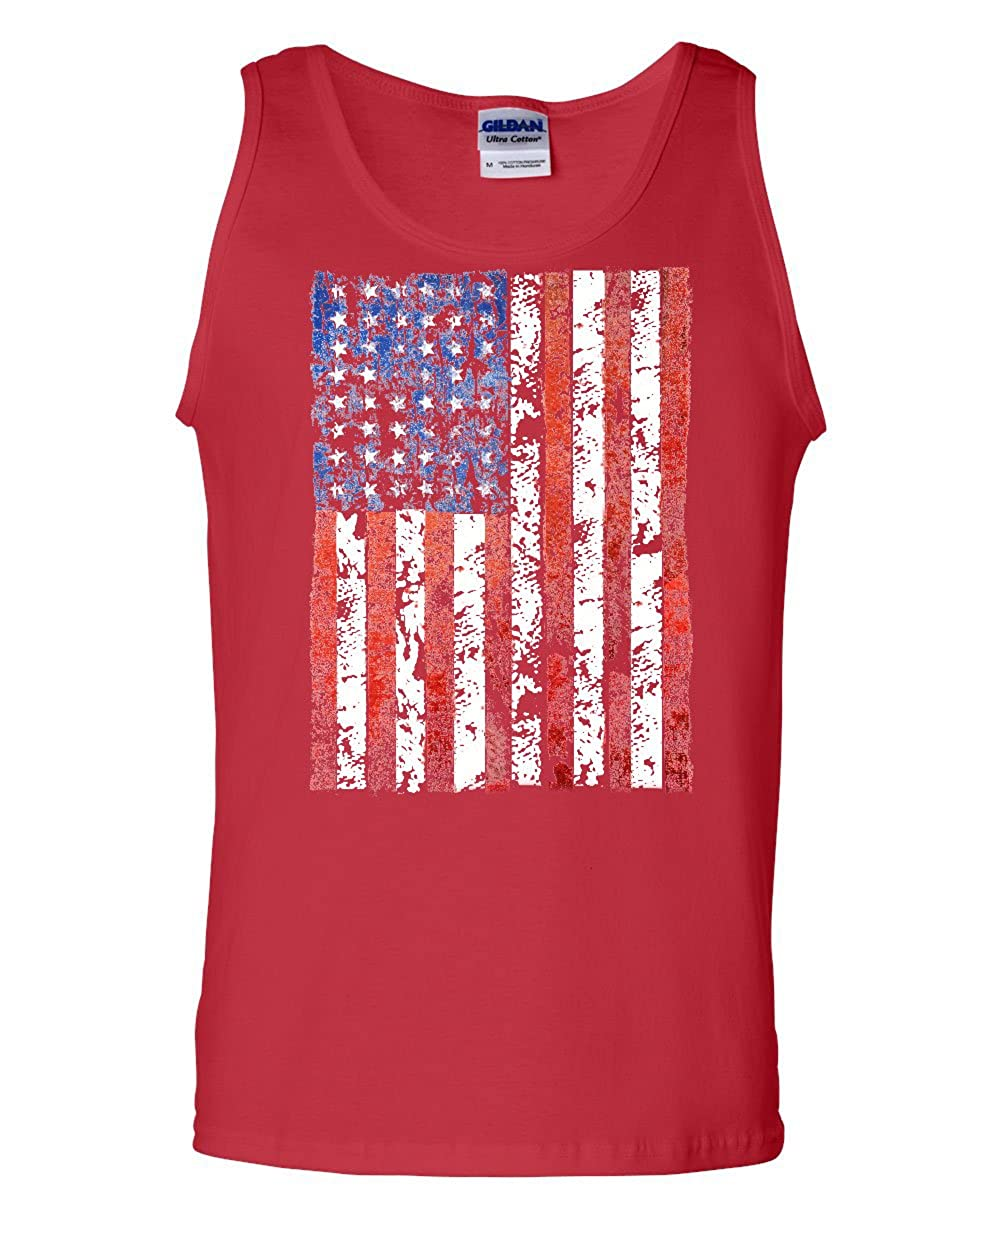 Tee Hunt Distressed US Flag Tank Top American Flag